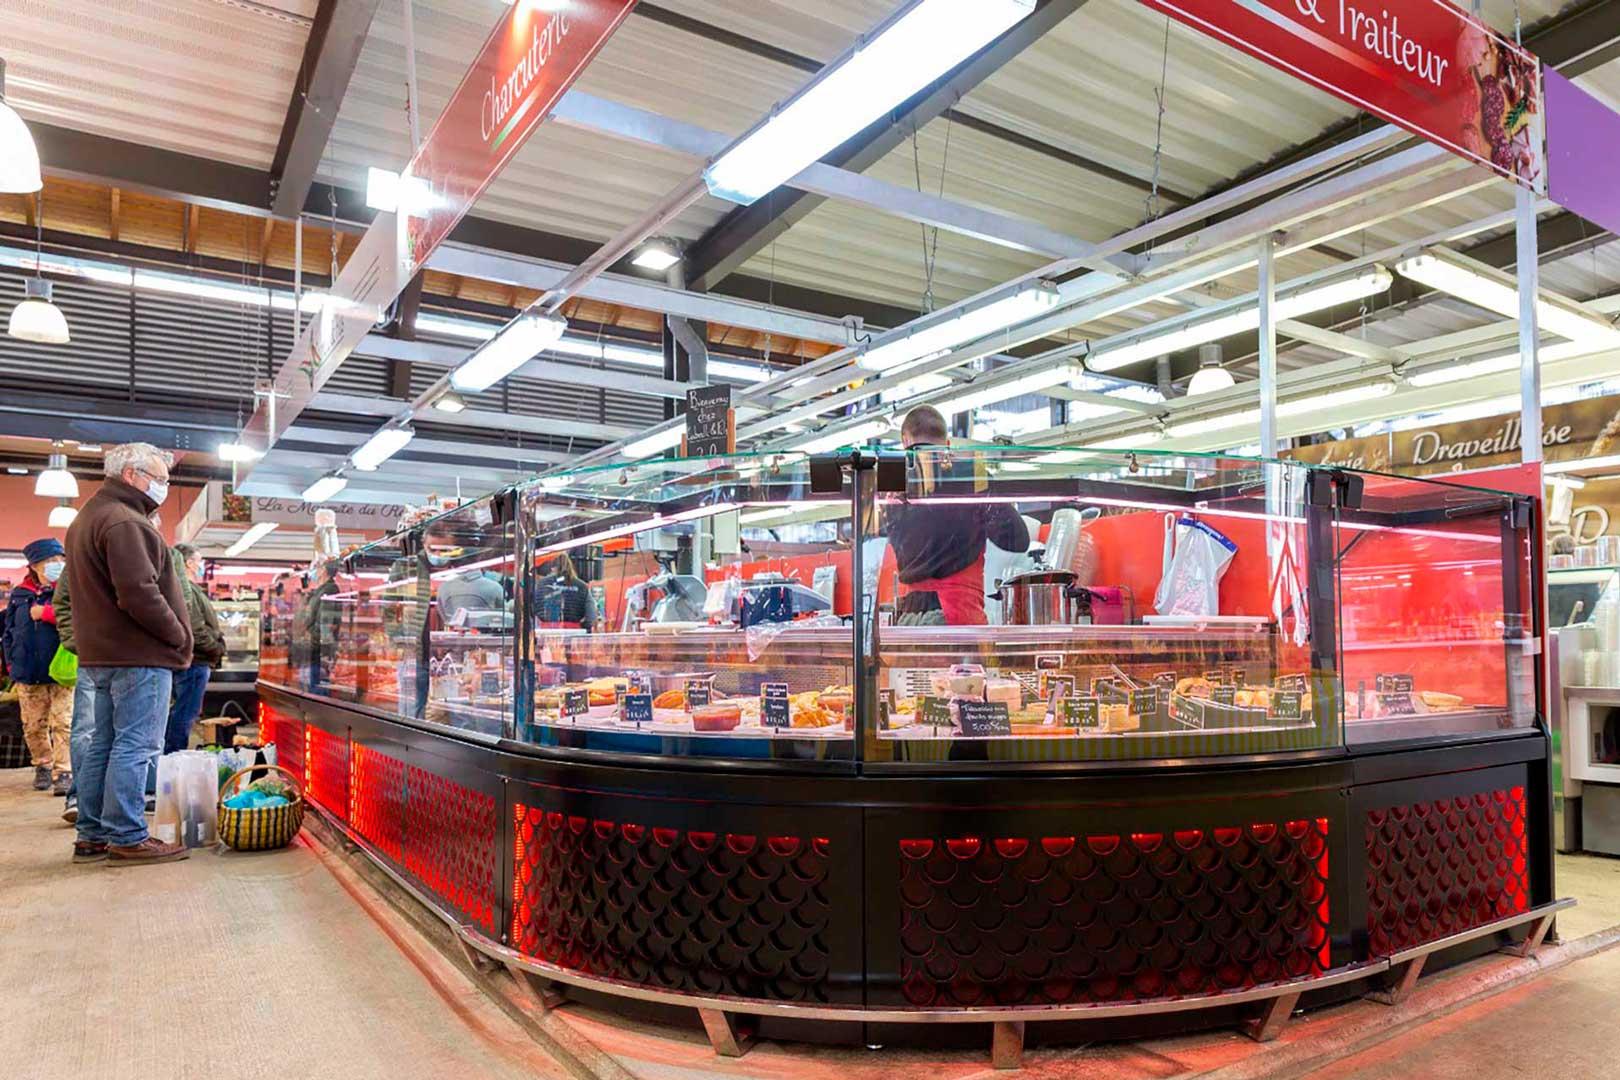 Refrigerated counters Missouri MC 120 M, minimarket CABRELLI & FILS in France